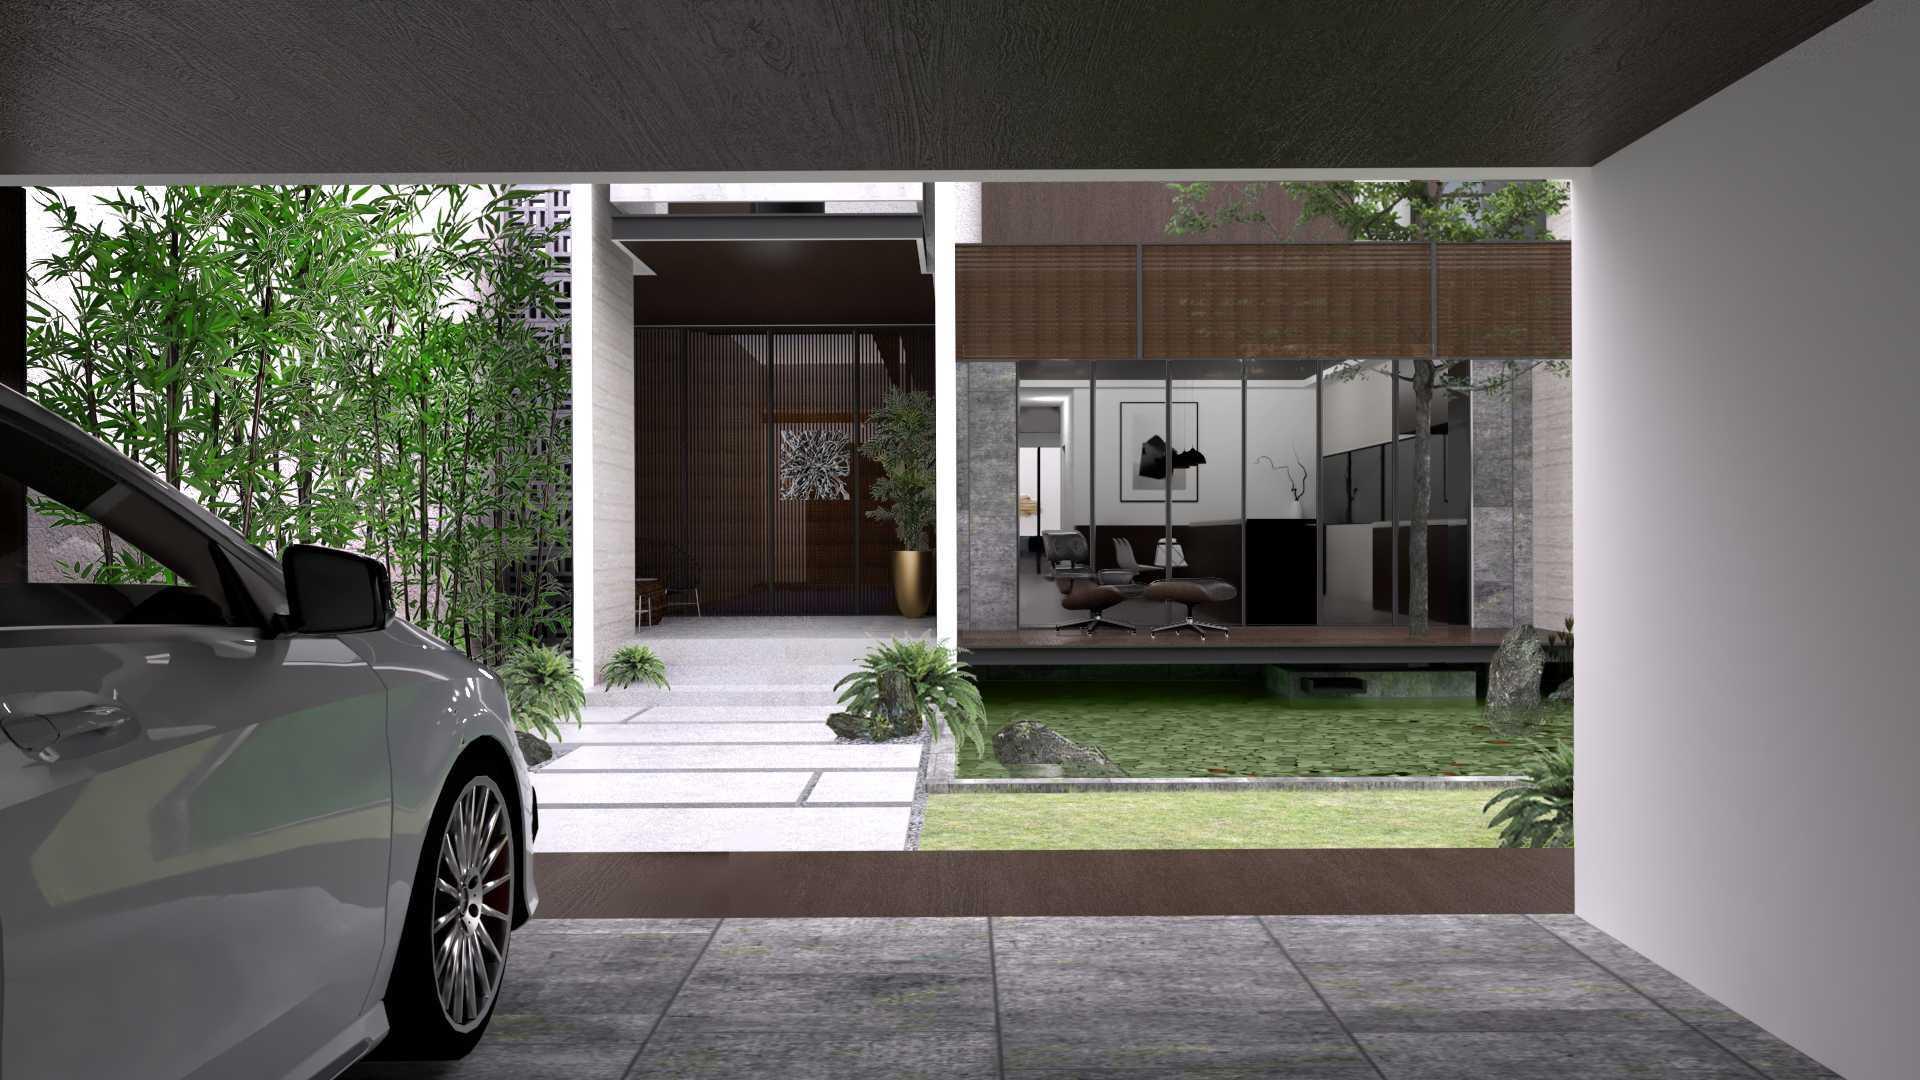 Arete Studio Rumah Kartini Kota Sby, Jawa Timur, Indonesia Kota Sby, Jawa Timur, Indonesia Courtyard Contemporary  46395